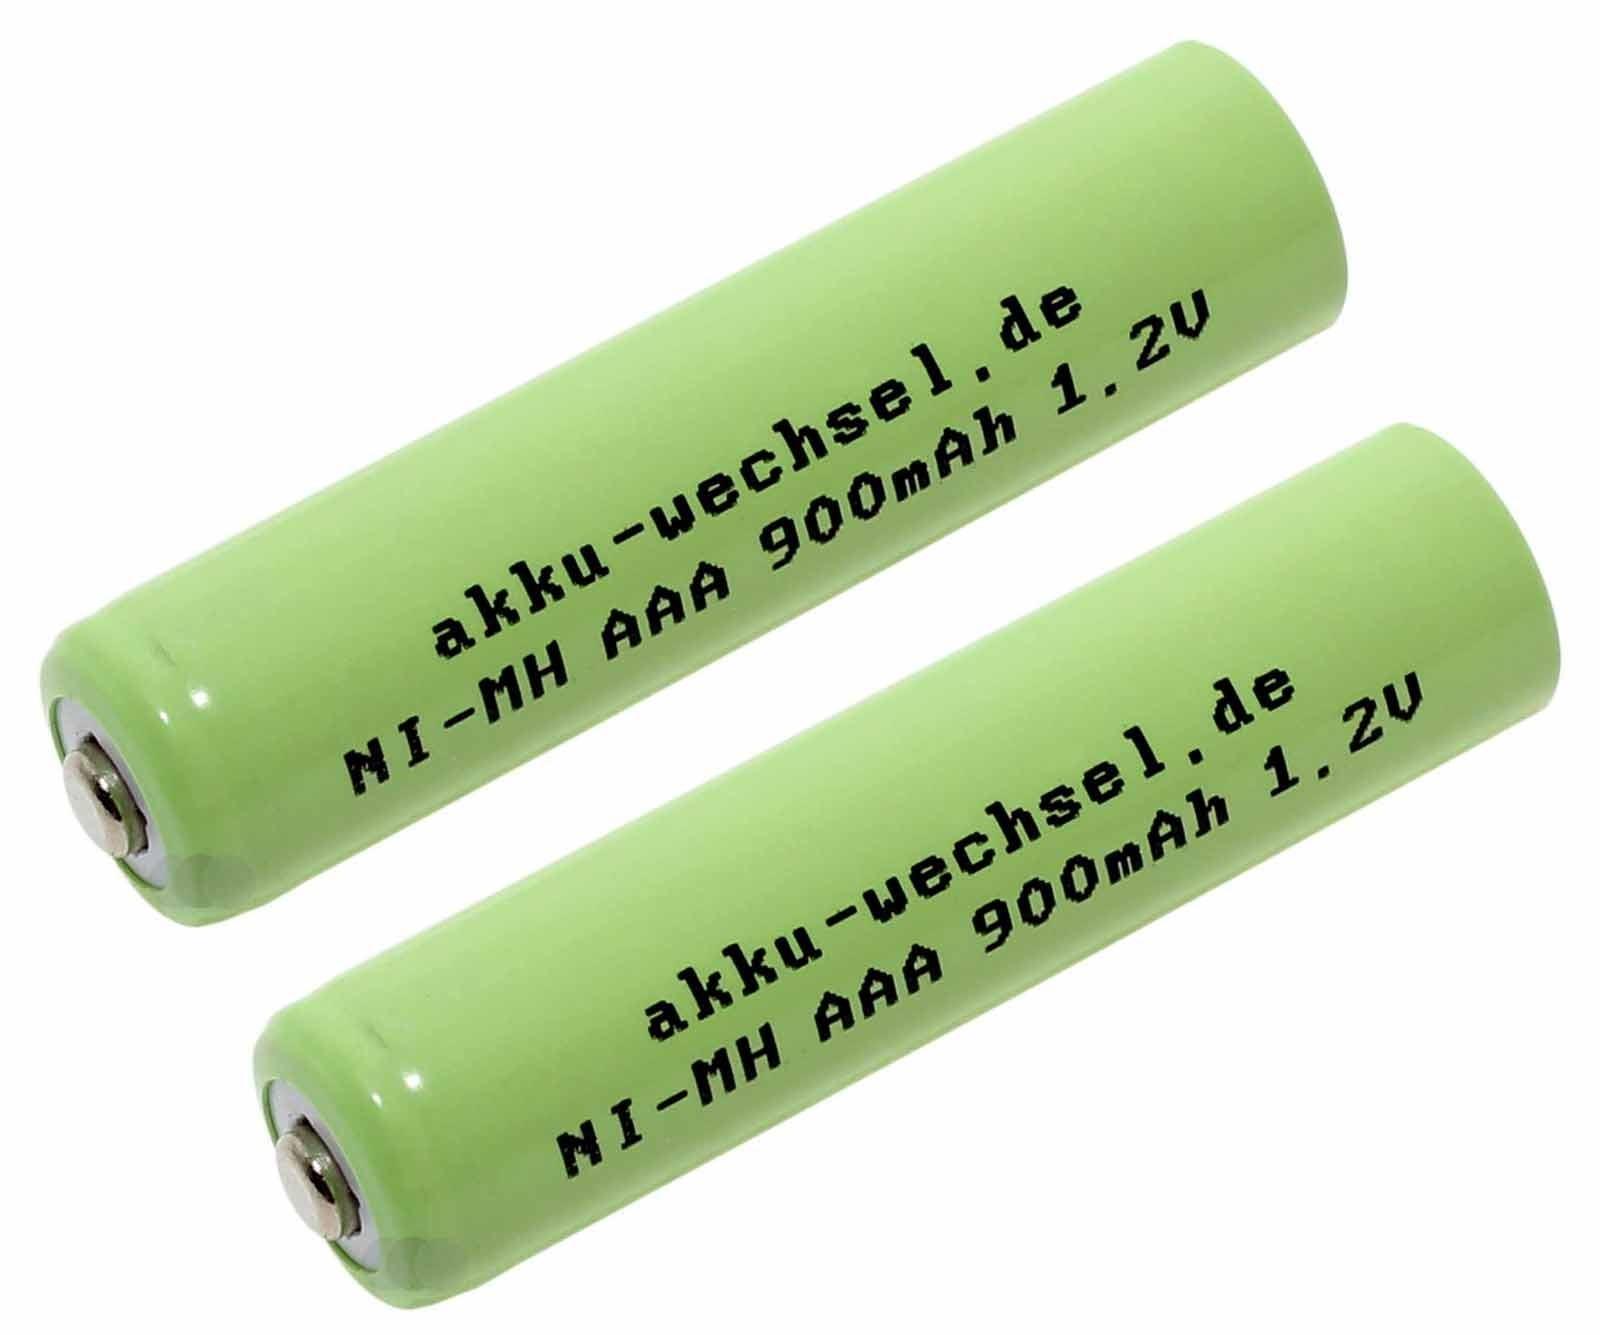 2x AAA NiMH Akku für Siemens Gigaset A400, C320, E360, SX455 u.a. DECT Telefone, 1,2V, 900mAh